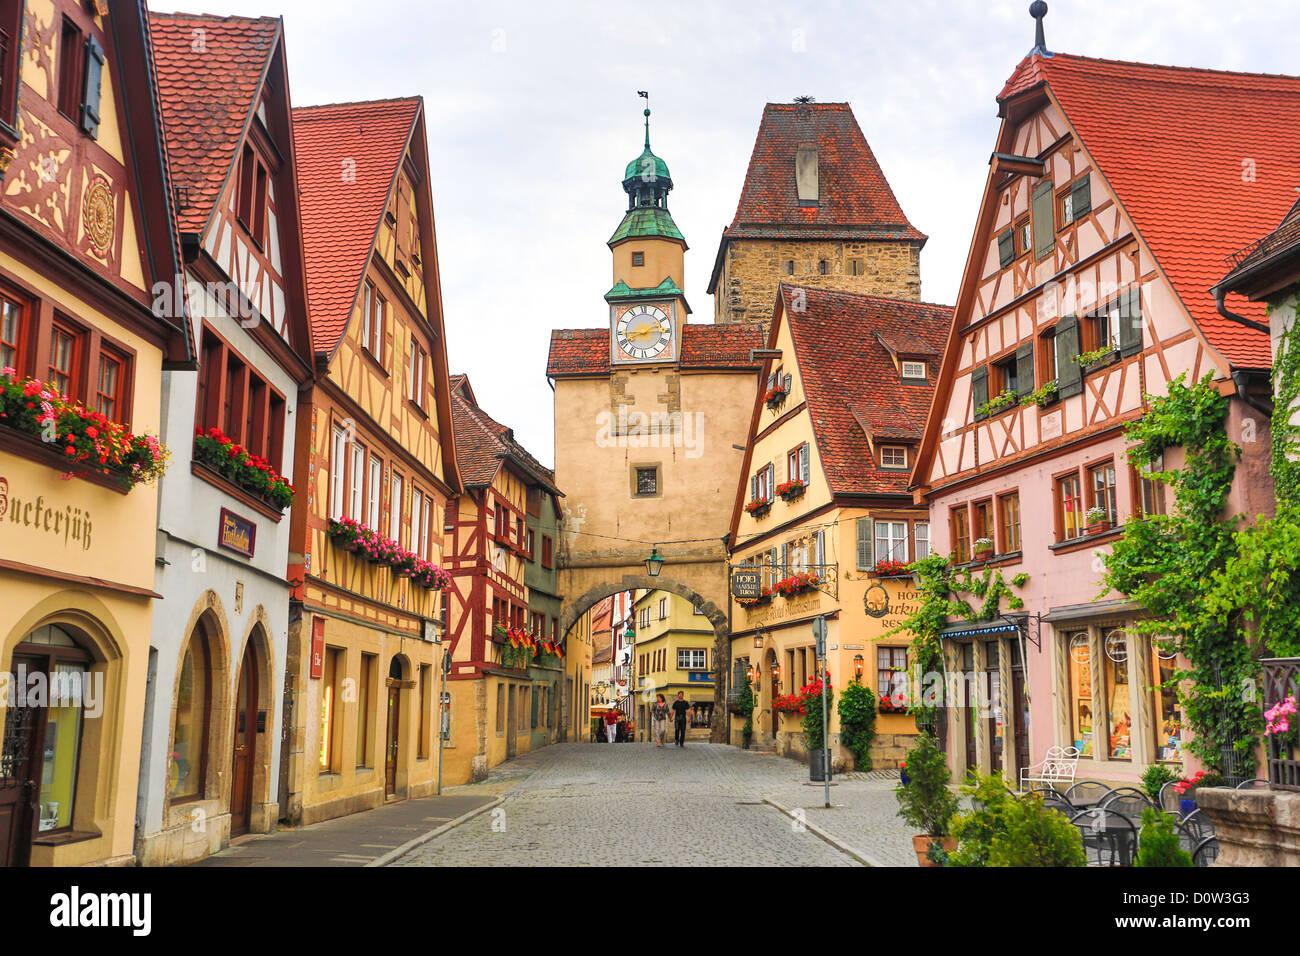 Germania, Europa, viaggi, Rothenburg, Strada Romantica, Rodergasse, Street, Markus, Gate, architettura, Baviera, Immagini Stock